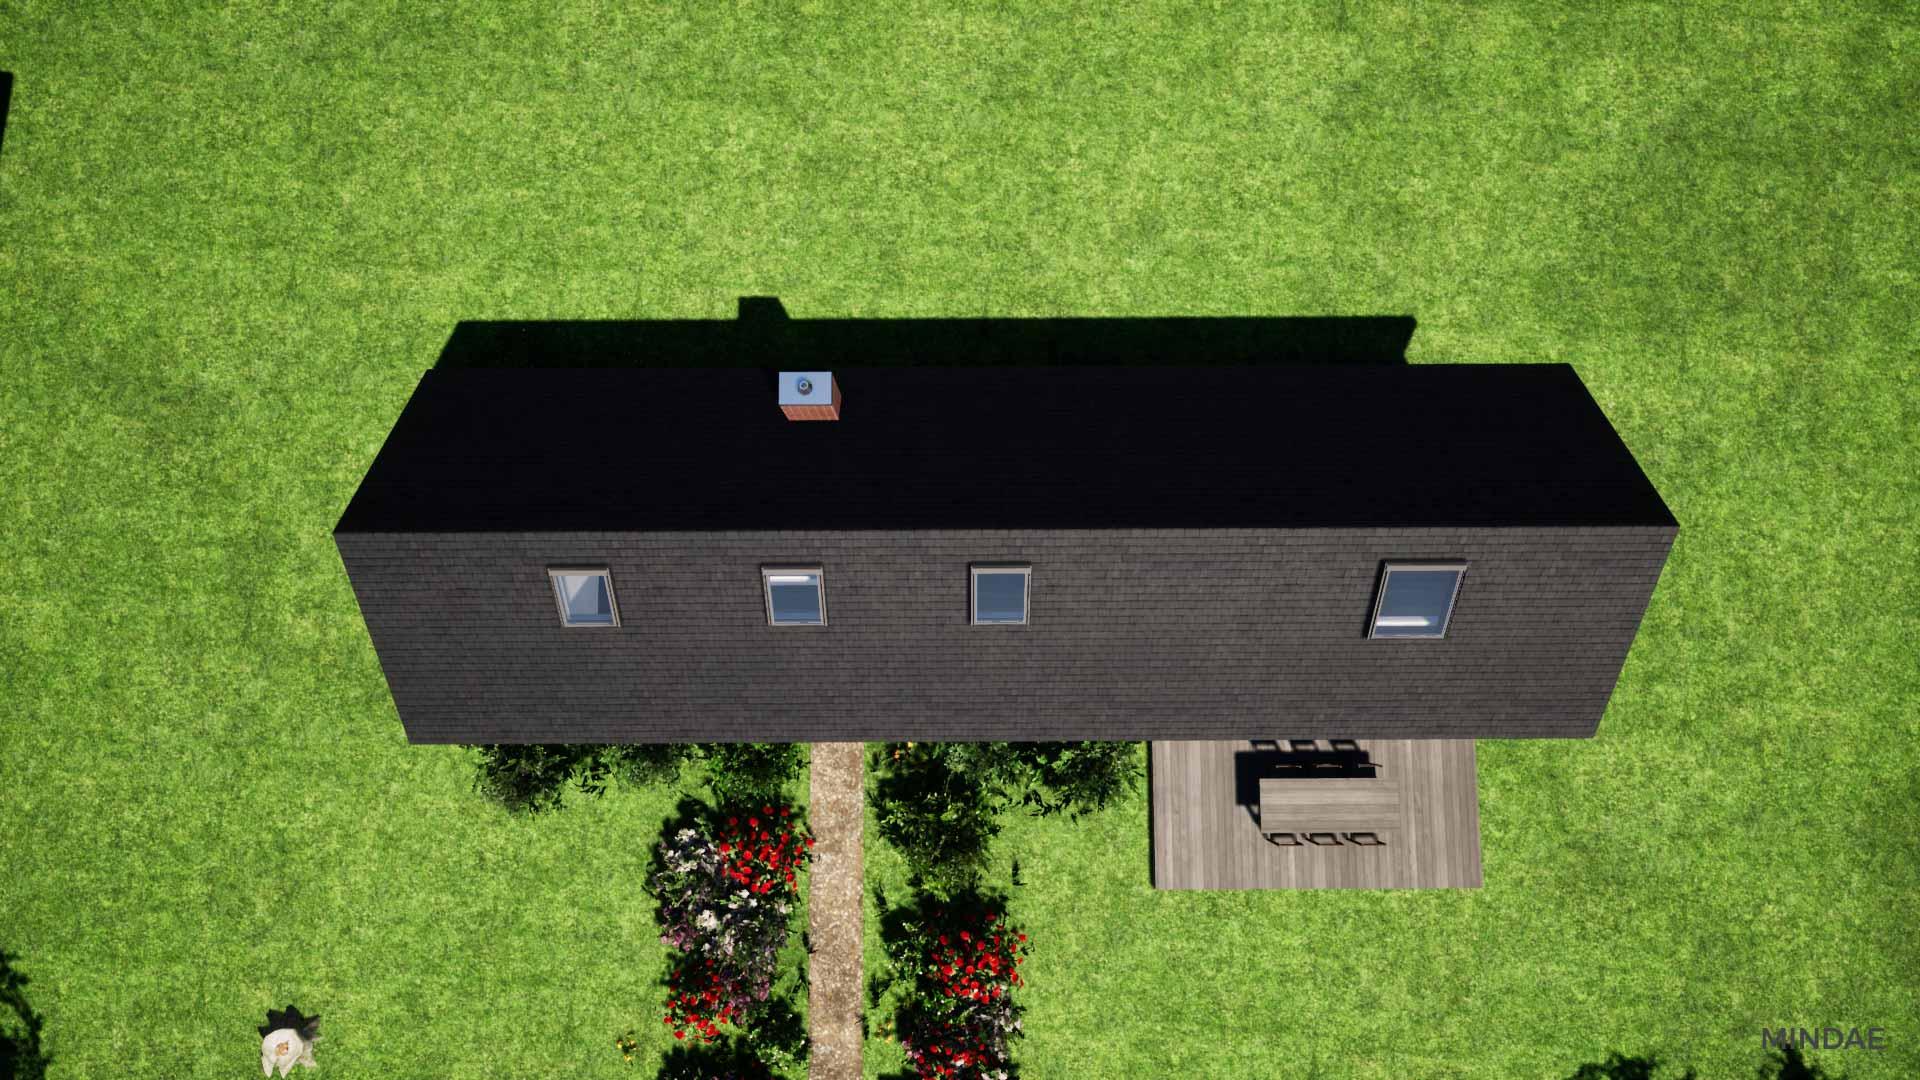 Mindae_3D_maison_extension_bois_Cambremer_terrasse-(0)